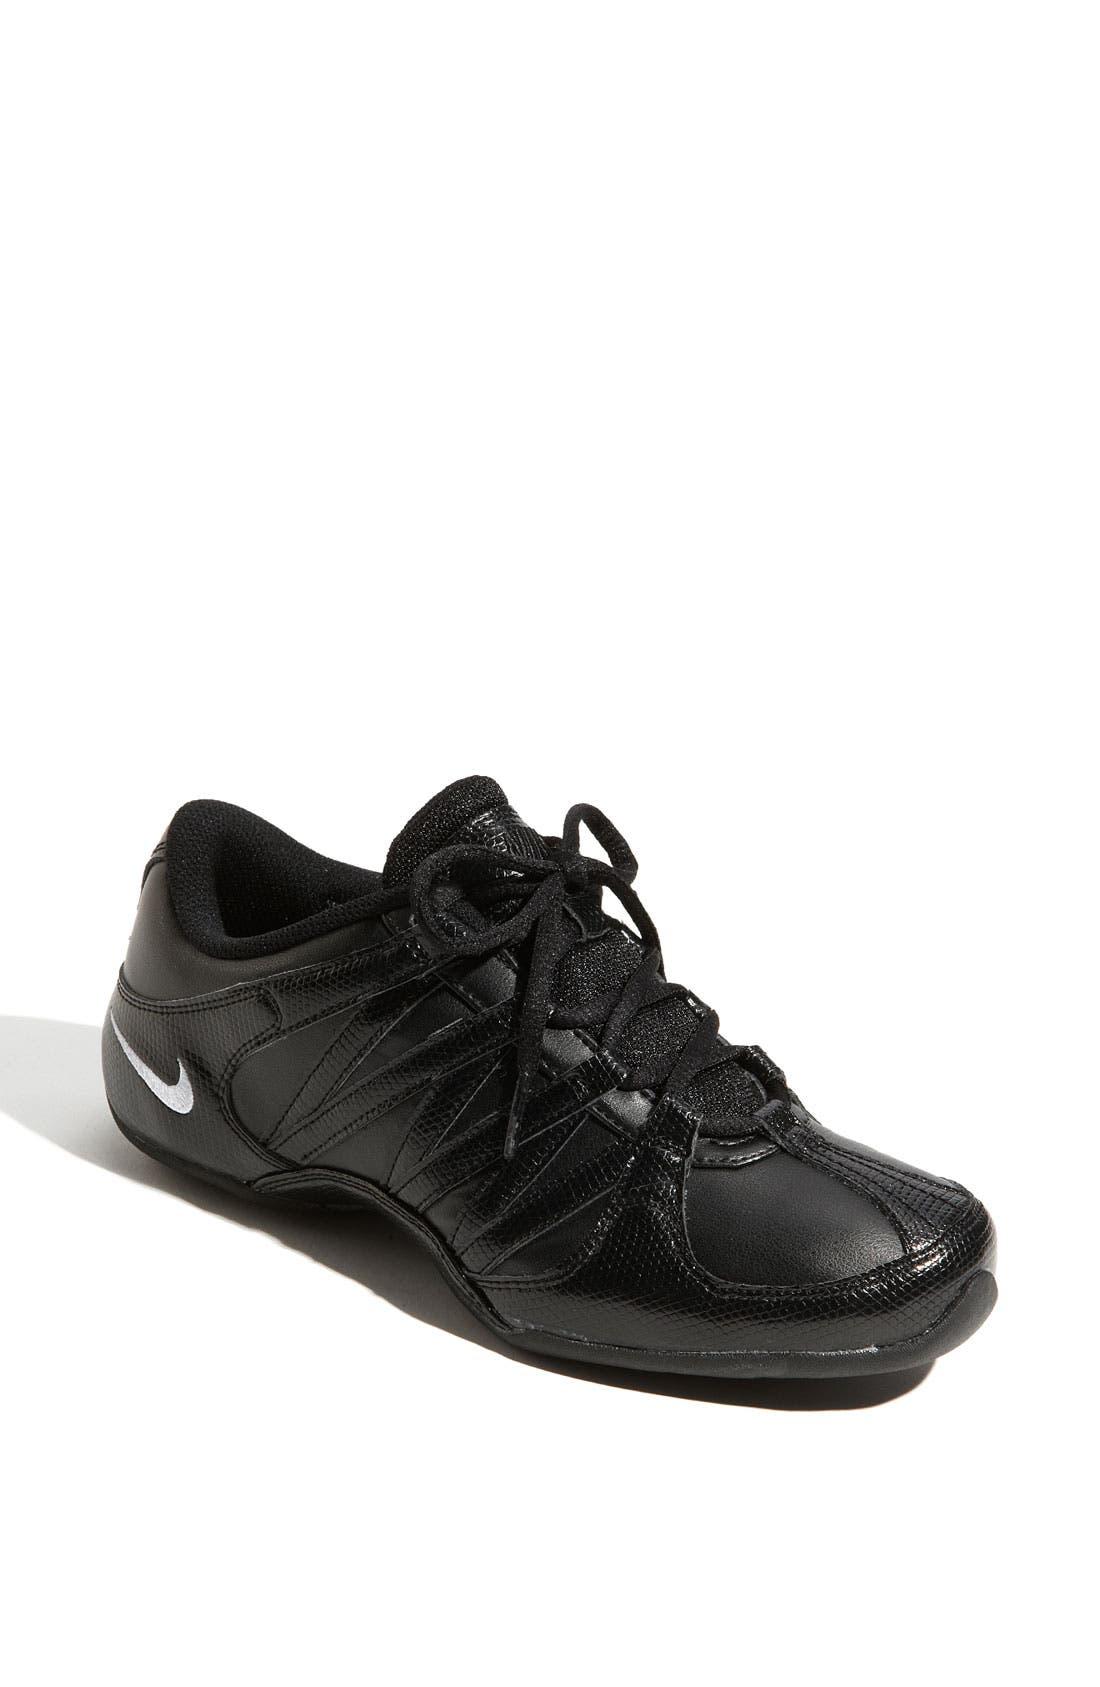 Main Image - Nike 'Musique IV' Dance Shoe